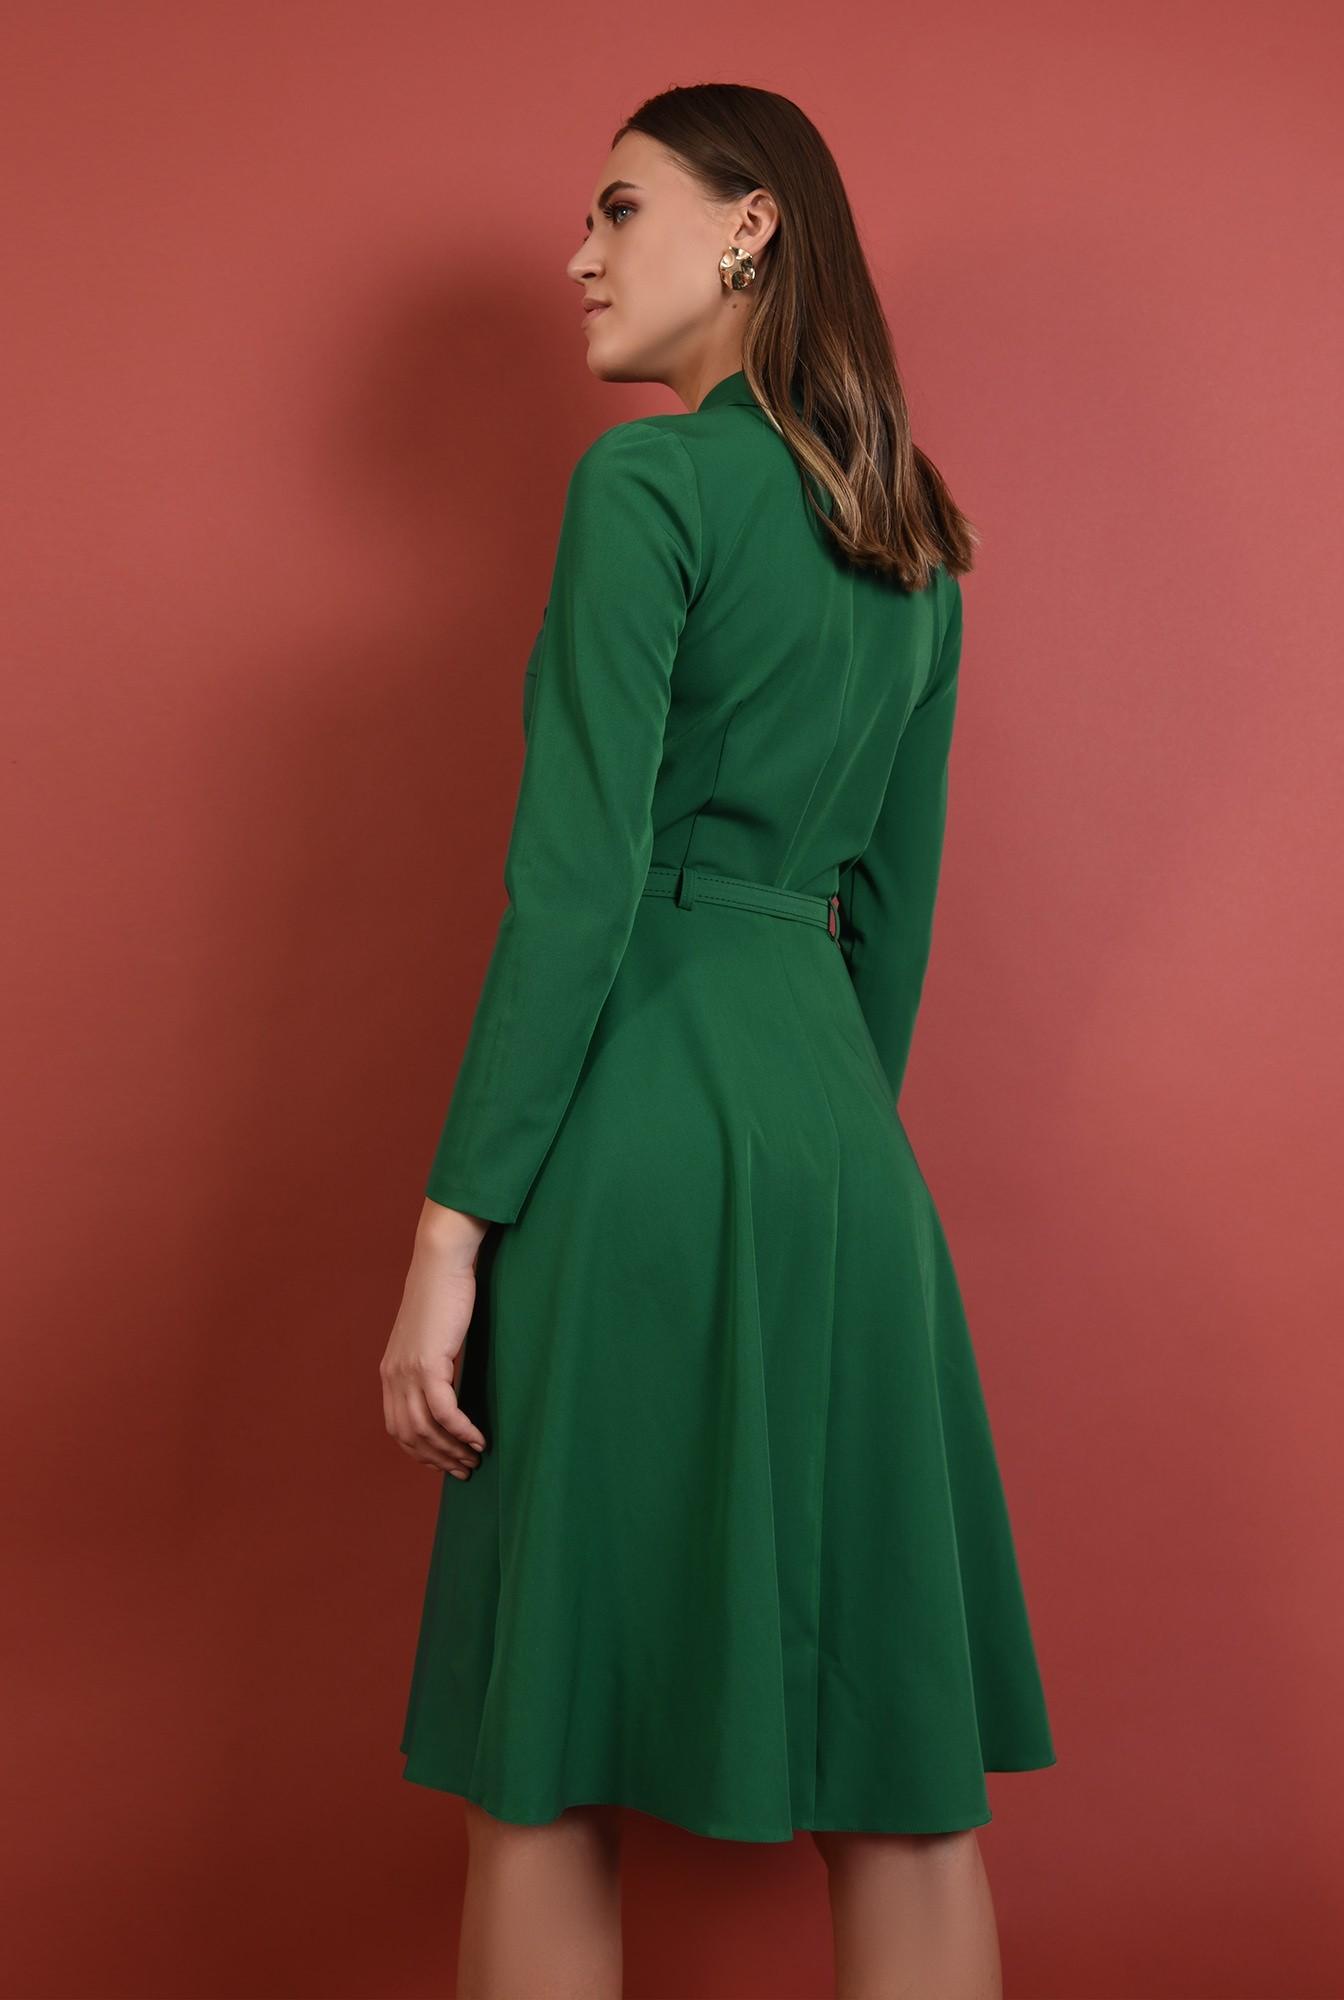 1 - 360 - rochie verde, office, midi, croi evazat, maneci lungi, curea, Poema